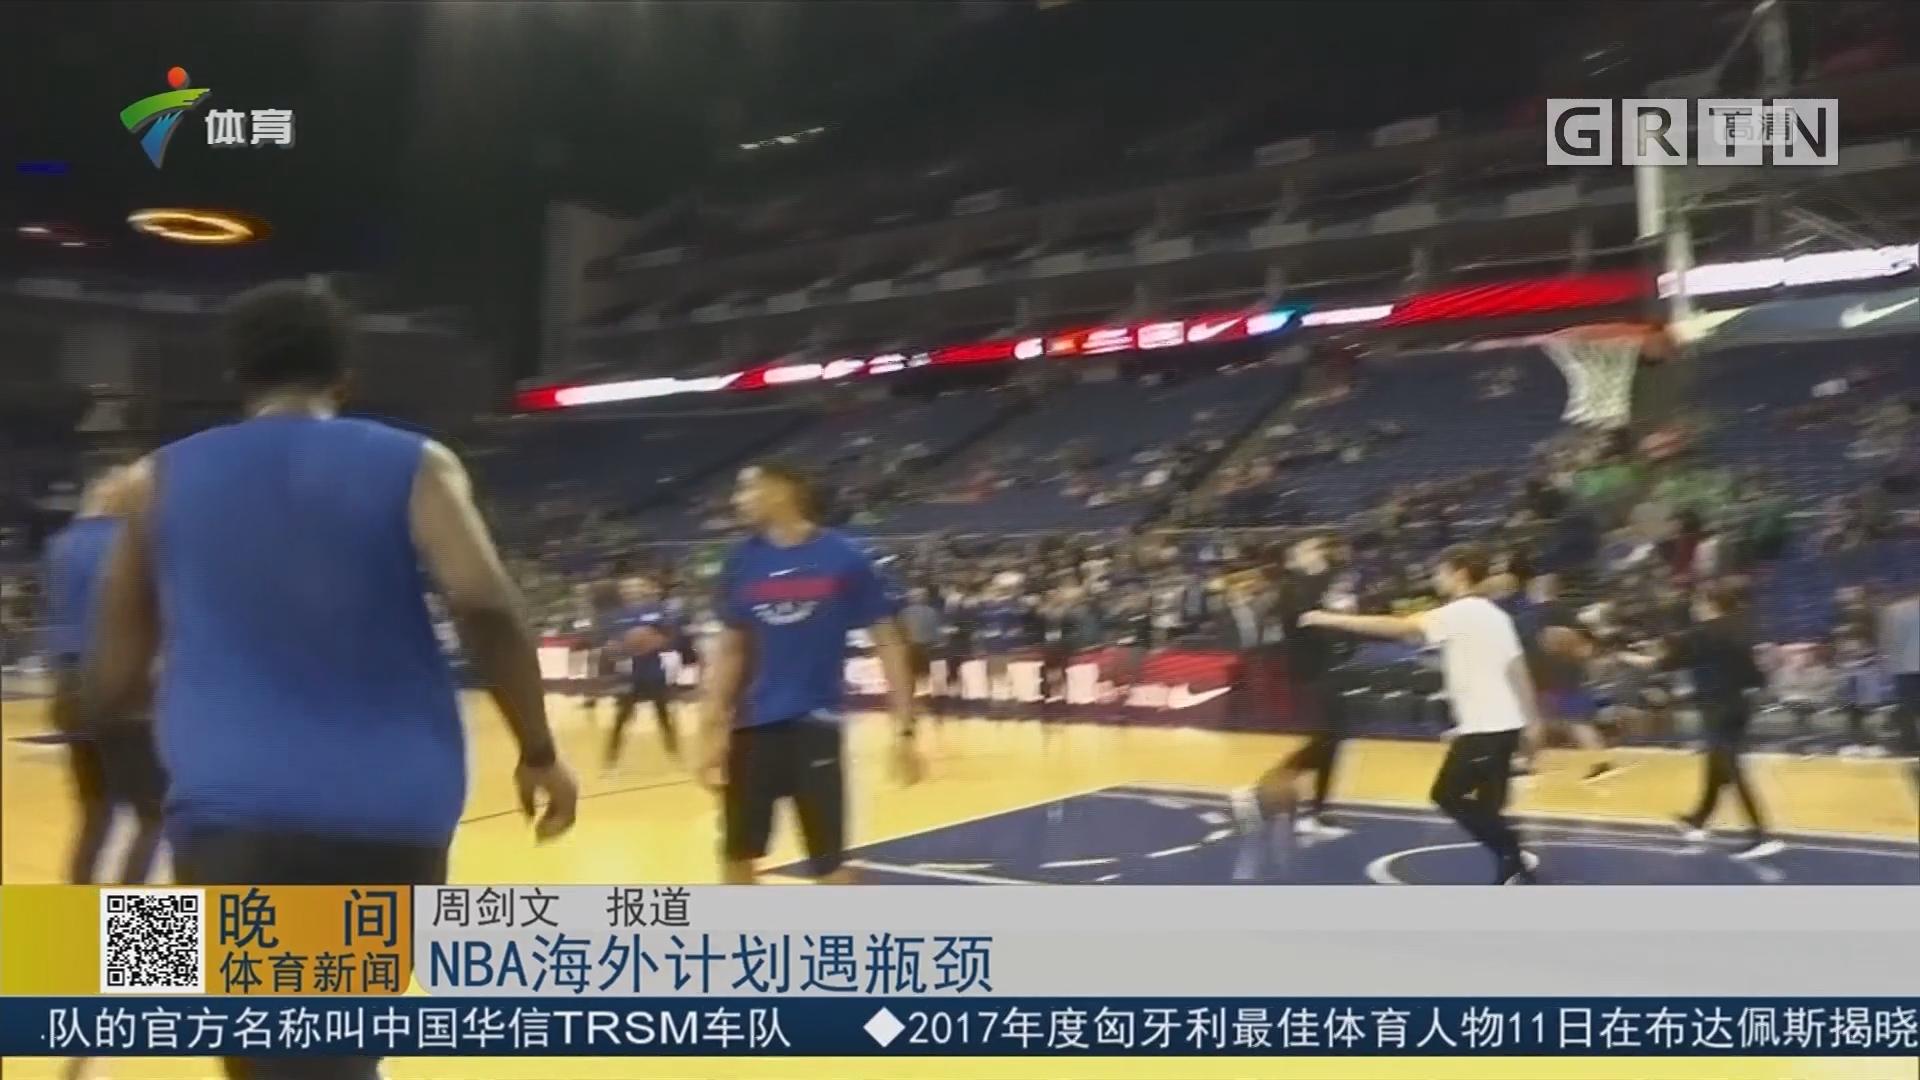 NBA海外计划遇瓶颈